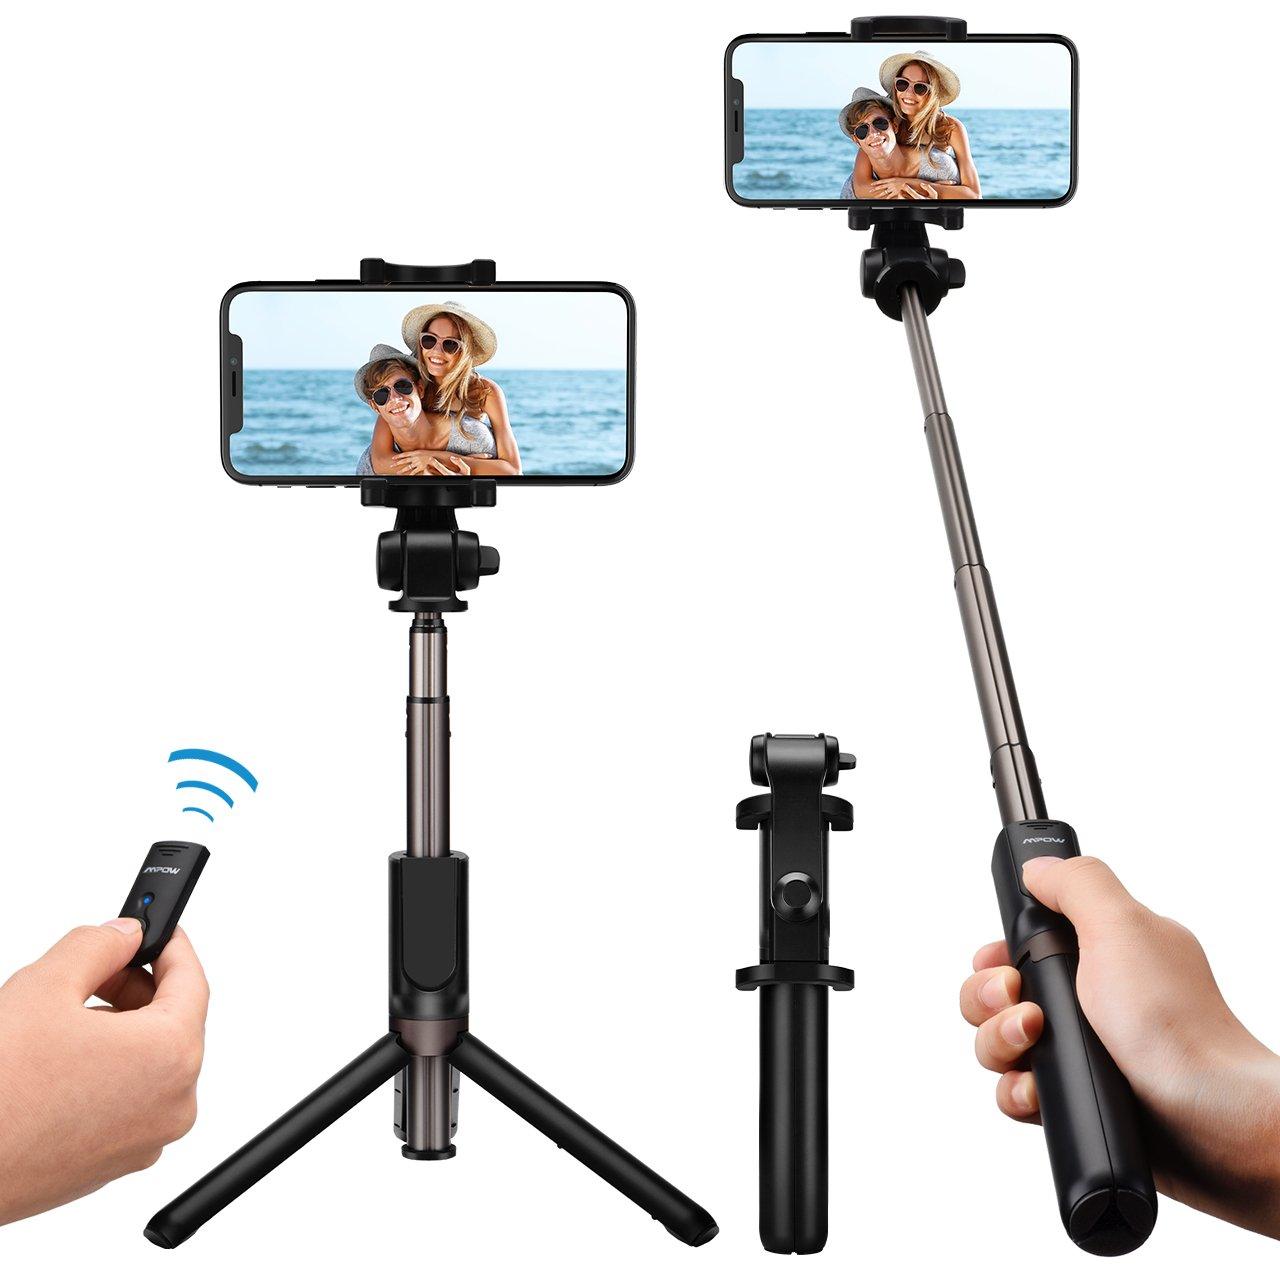 2 piezas monopi/é tr/ípode palo selfie tel/éfono soporte adaptador para iPhone Xs Max X 8 8 Plus 7 7 Plus 6 6s 5S 5 SE